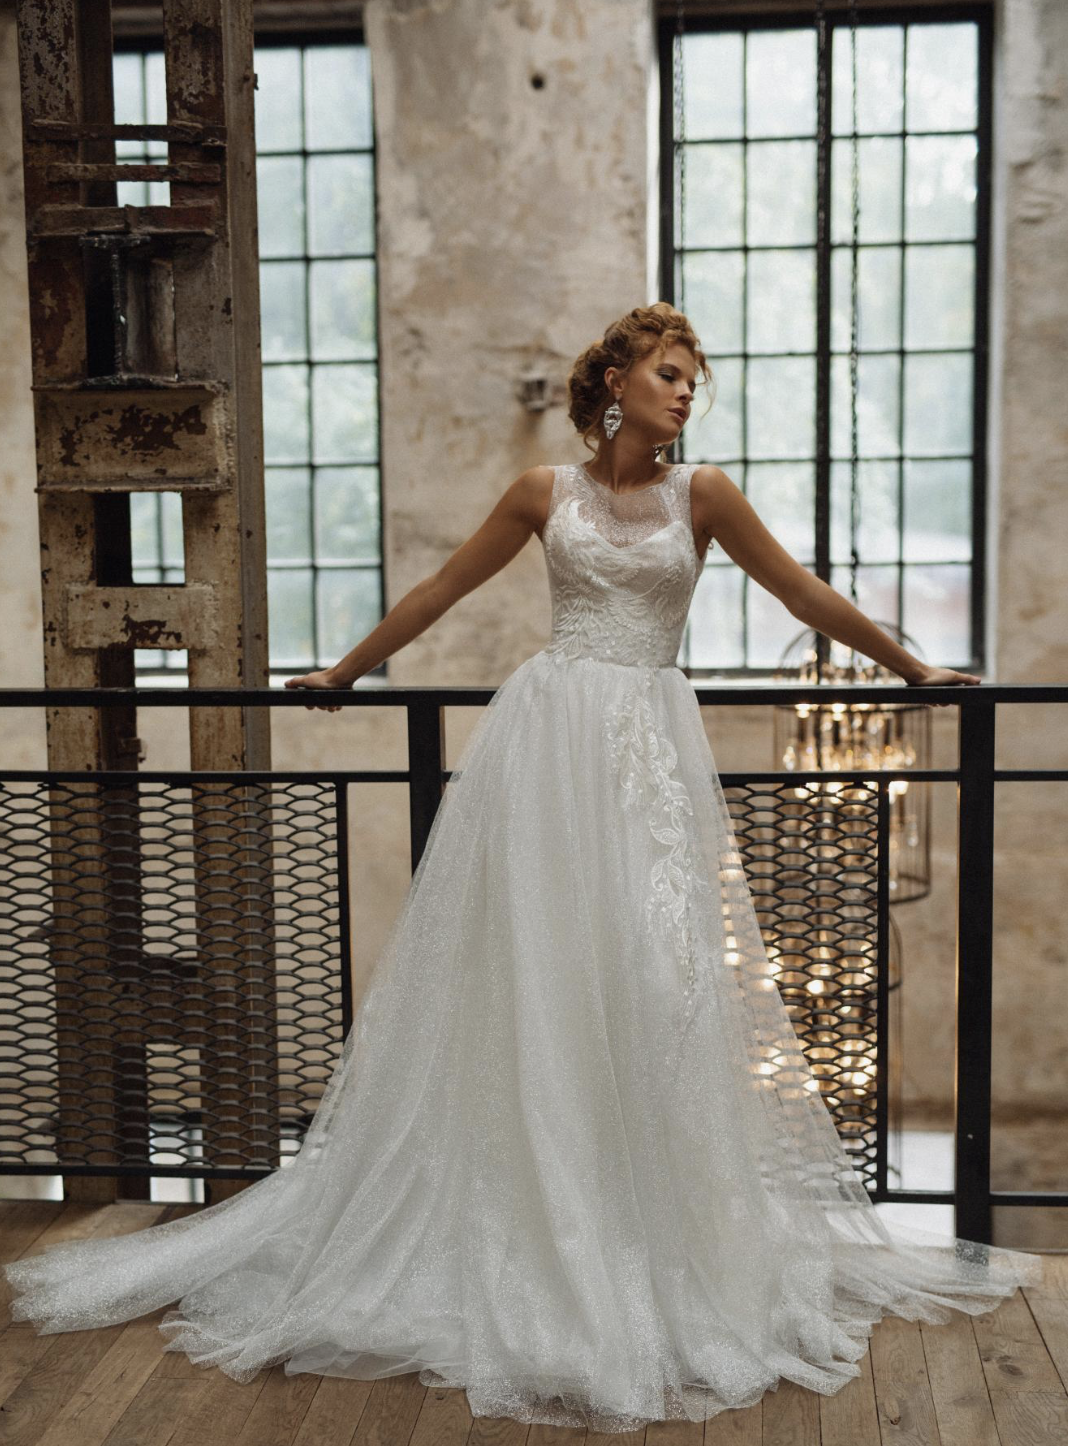 Eshli Wedding Dress Wedding Dresses Dresses Wedding Dress Shopping